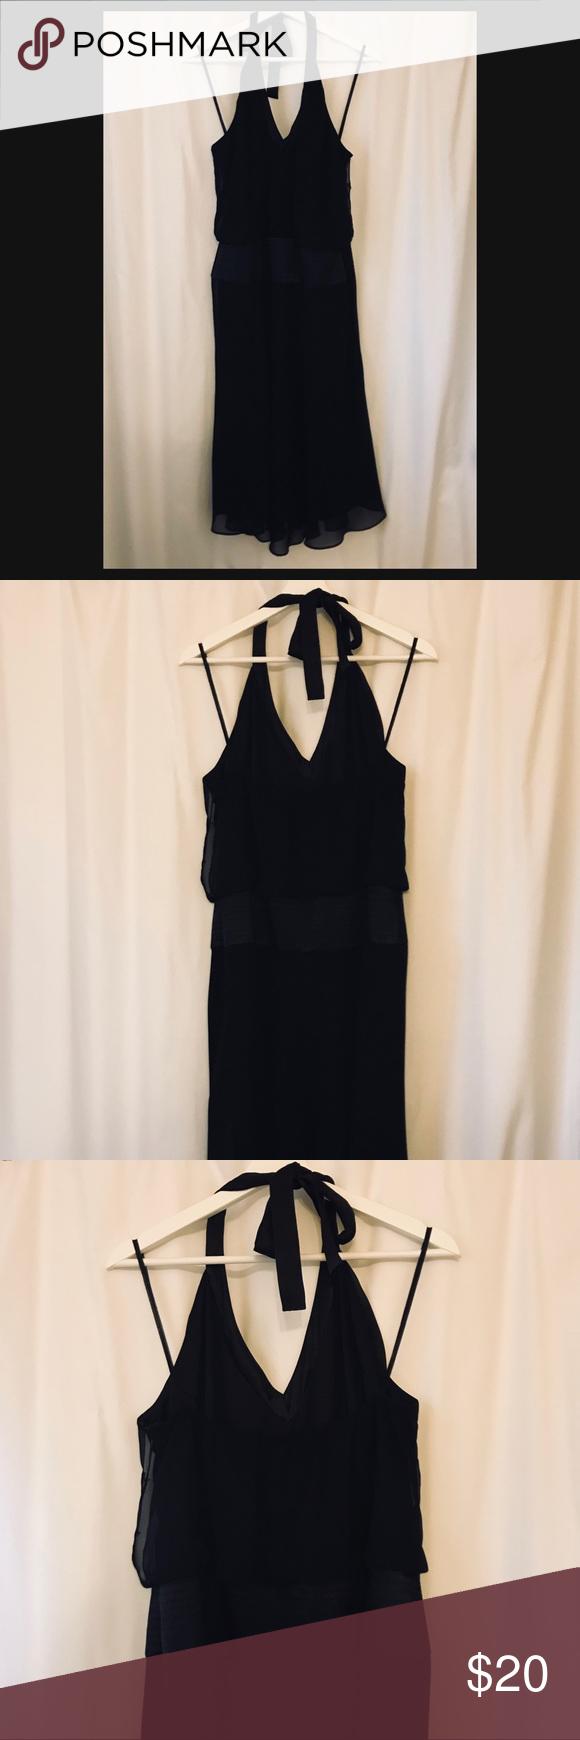 Sl Fashions Macy S Black Halter Cocktail Dress Sl Fashions Black Halter Cocktail Dress Fashion [ 1740 x 580 Pixel ]